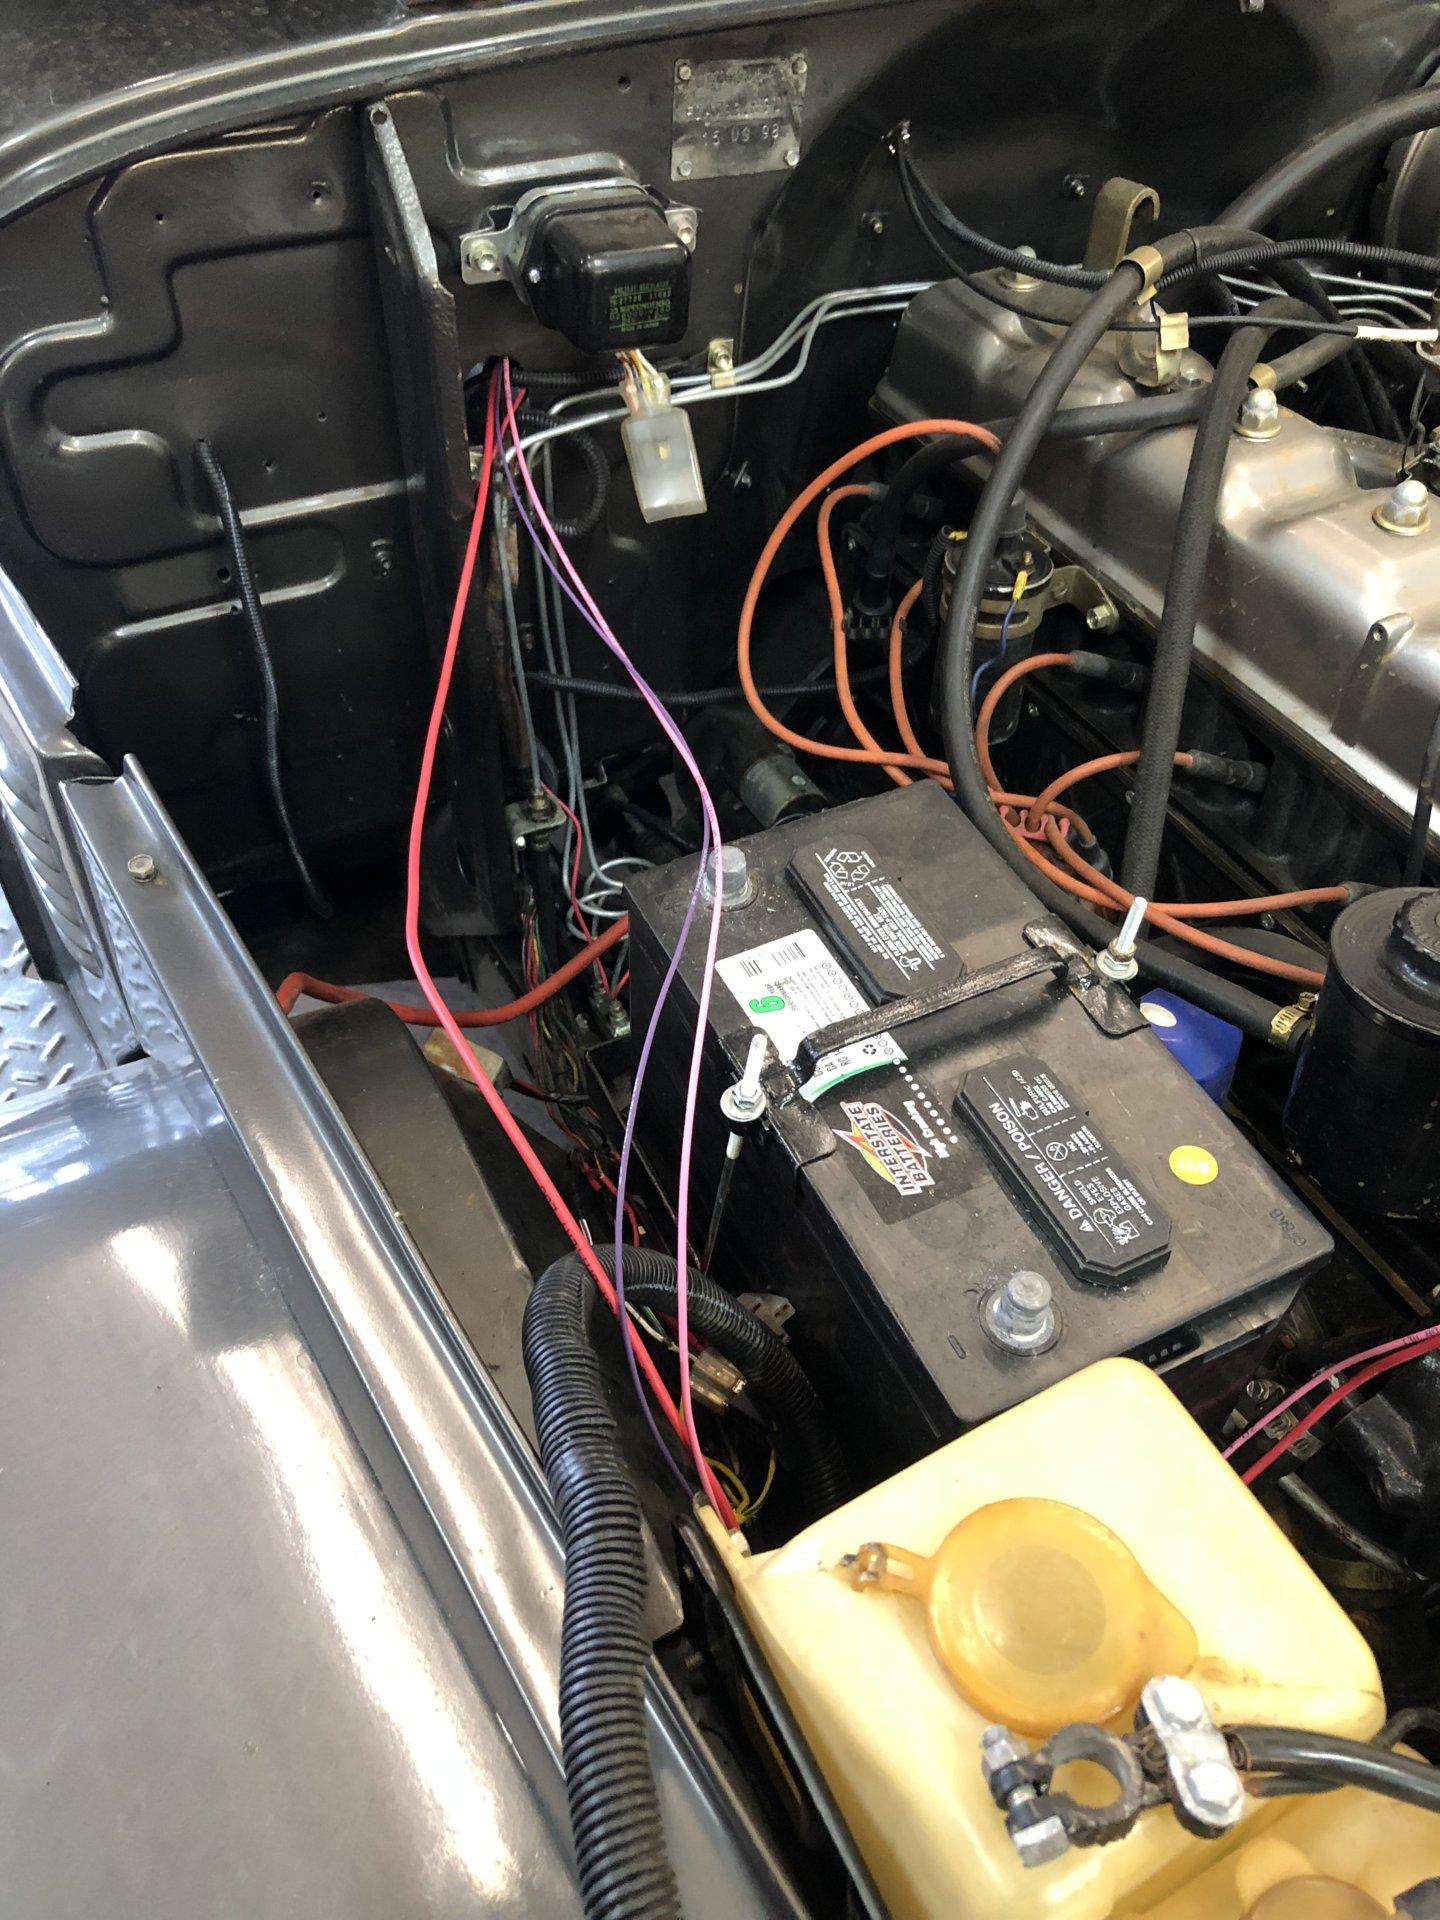 Rewiring A 1974 Toyota Land Cruiser Fj40 Using Kwik Wire Kit Wiring Harness Universal